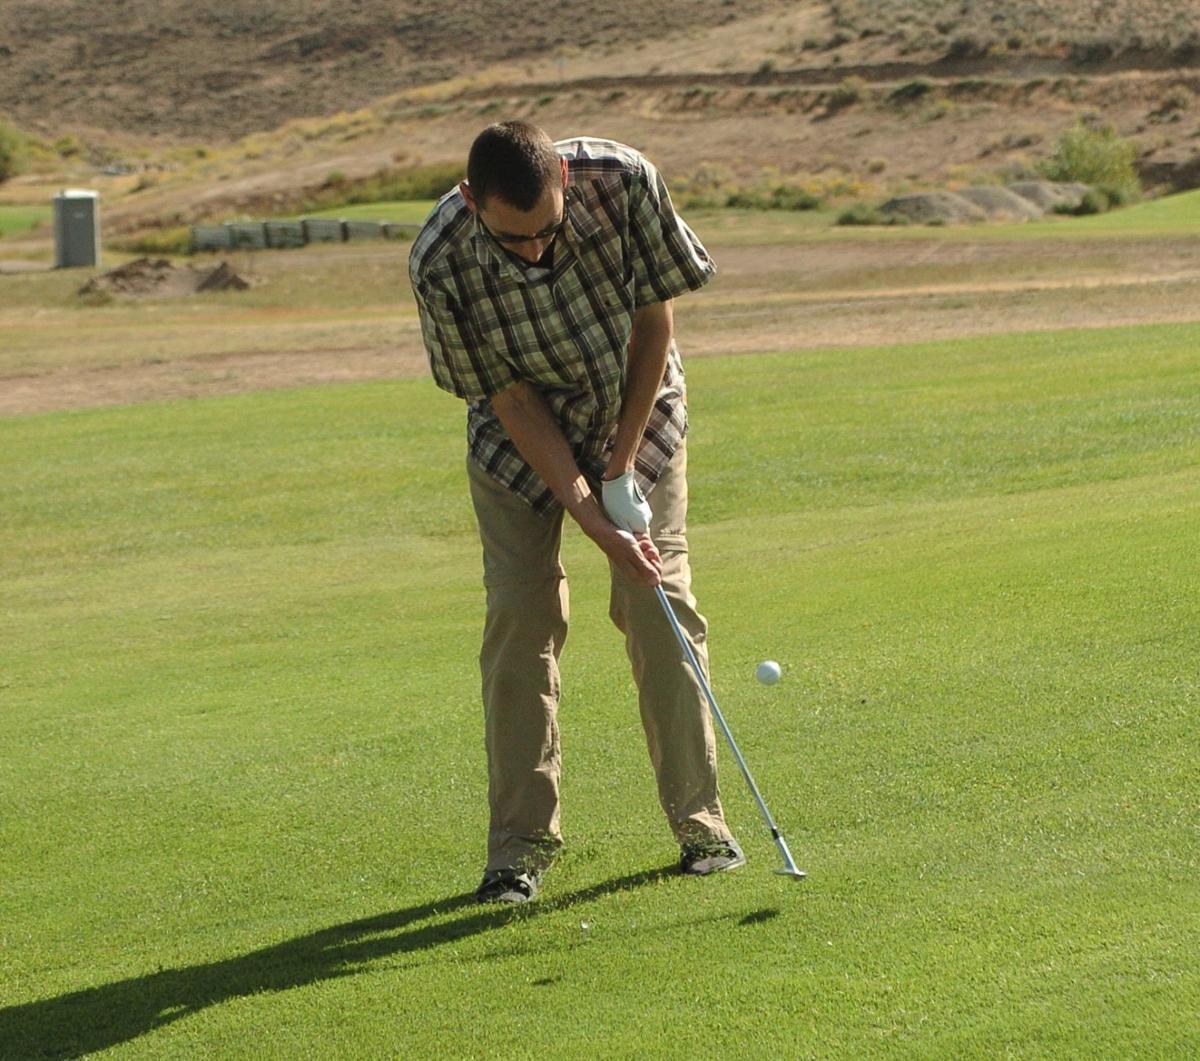 golf steve sidlo 9.18.jpg